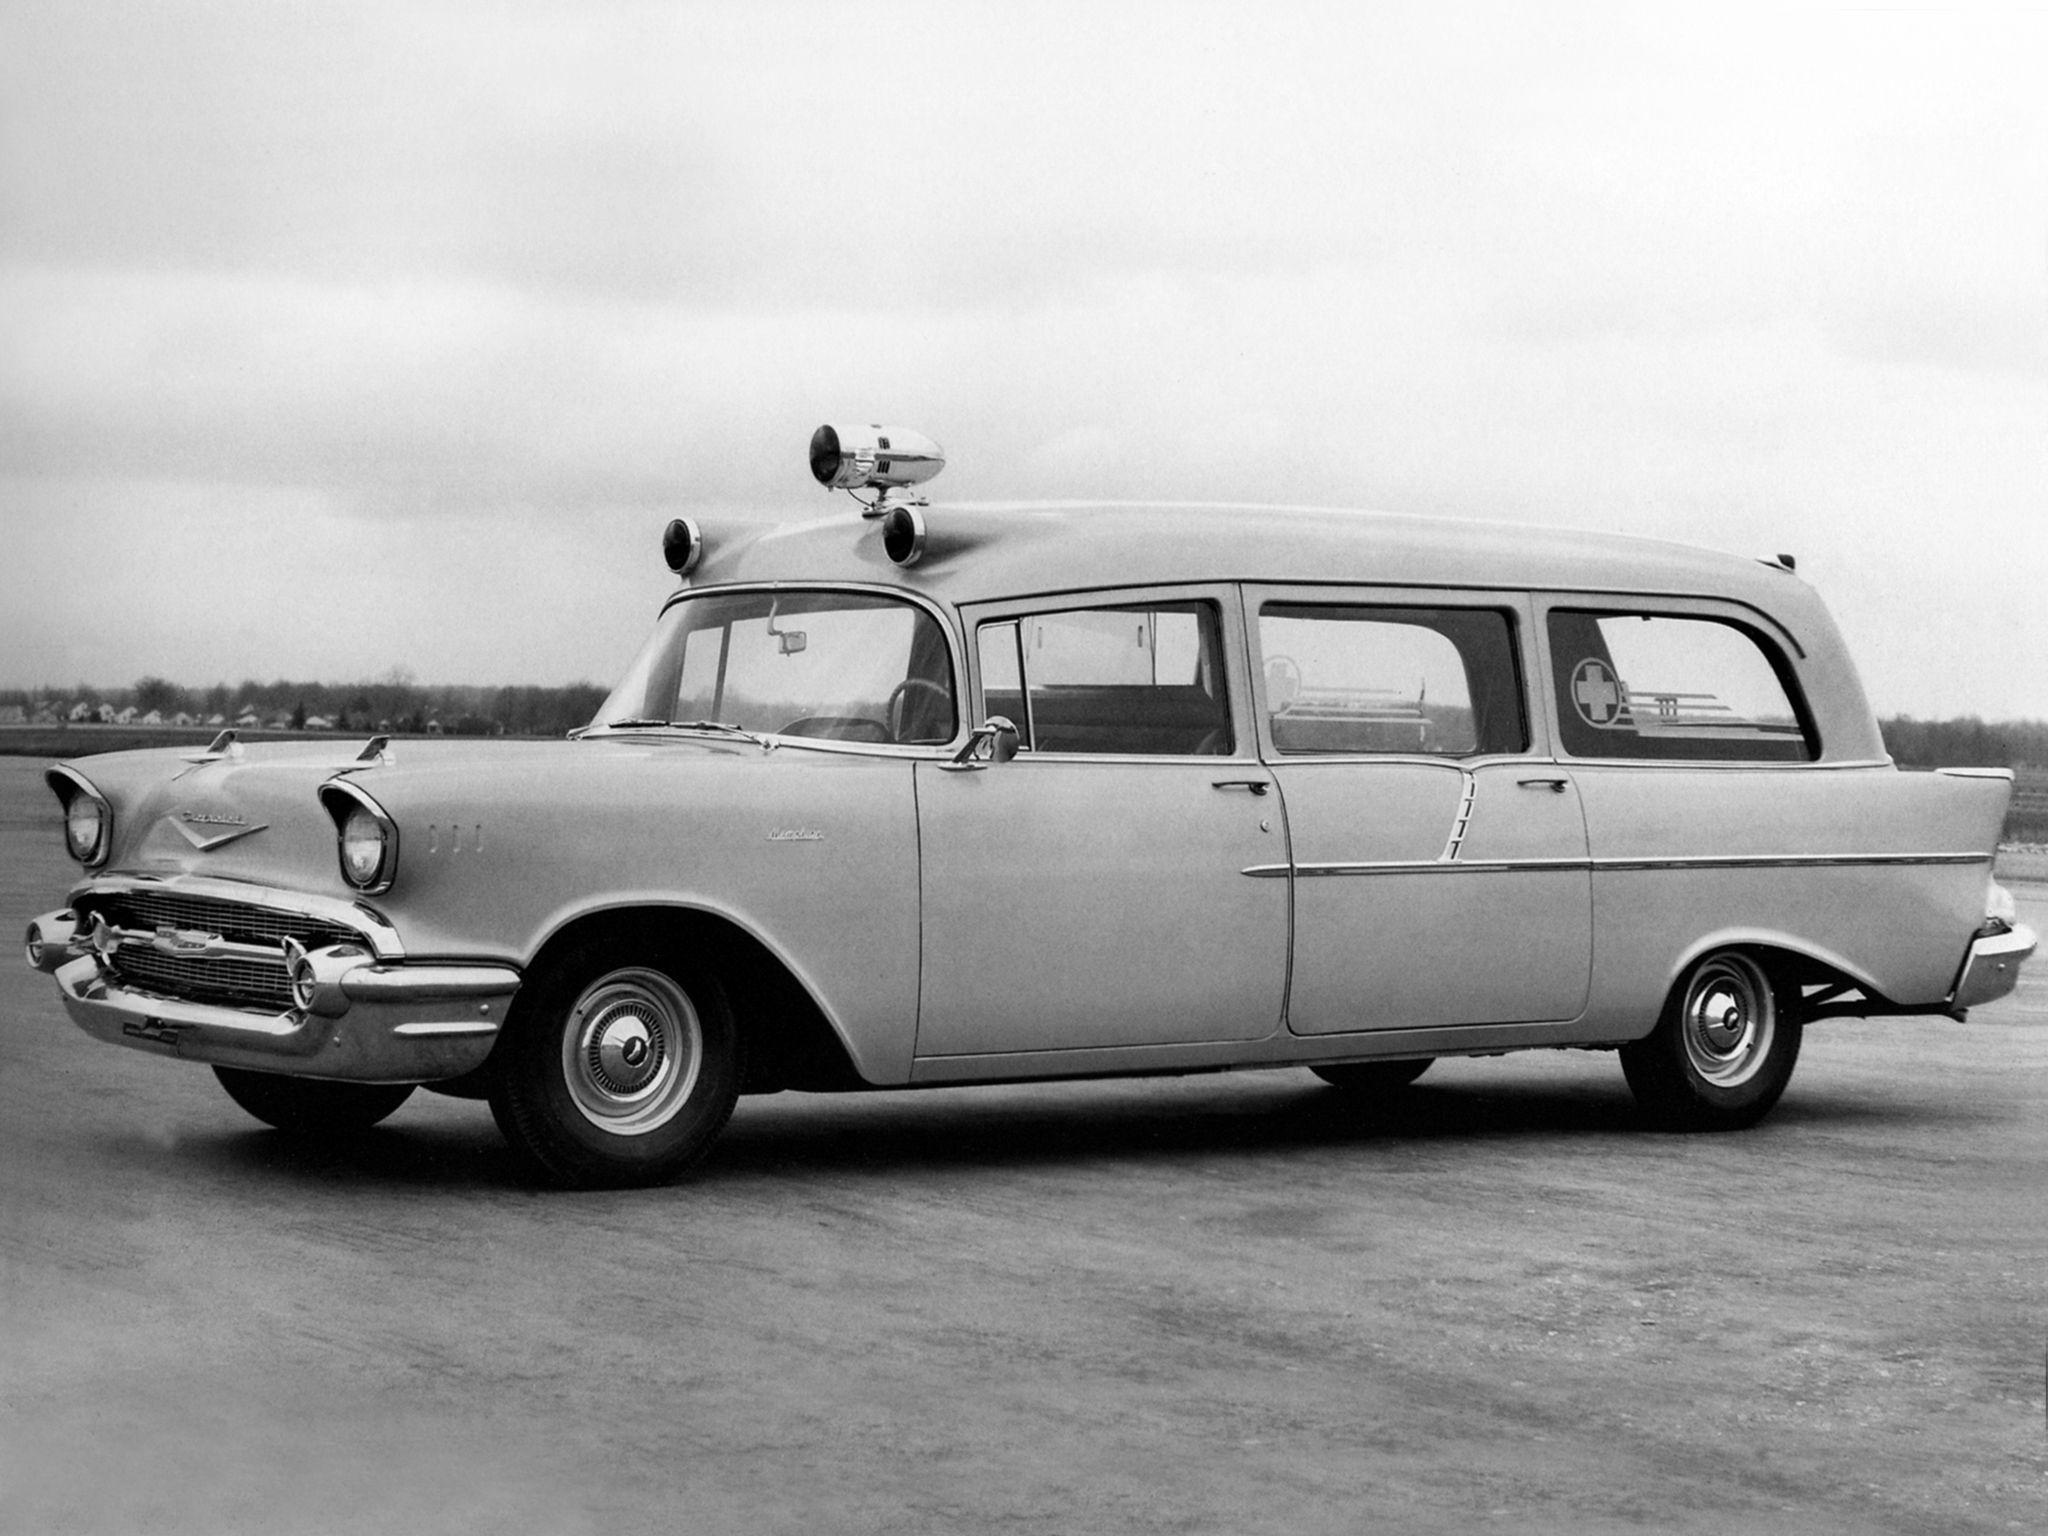 1957 Chevy Ambulance Cadillac Classic Cars Pinterest Panel Truck